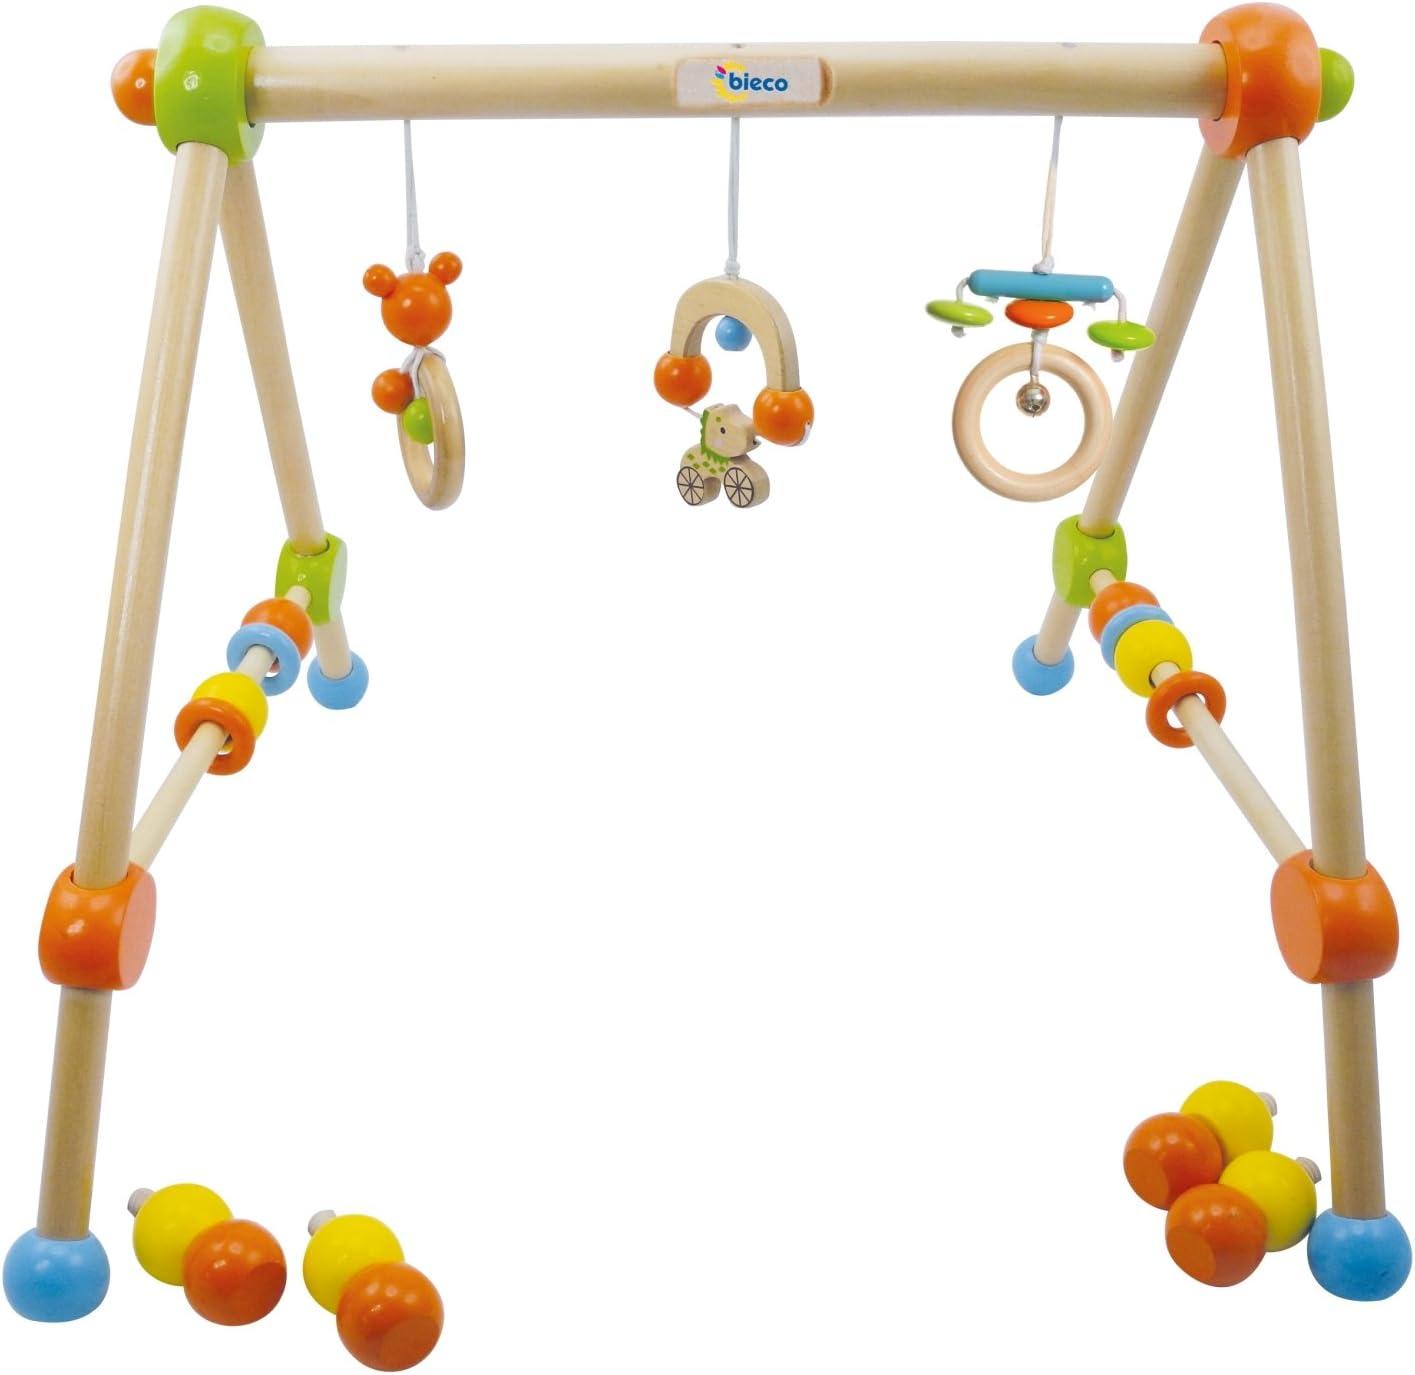 Bieco 4002315 - Gimnasio de madera para bebés (altura regulable), color verde